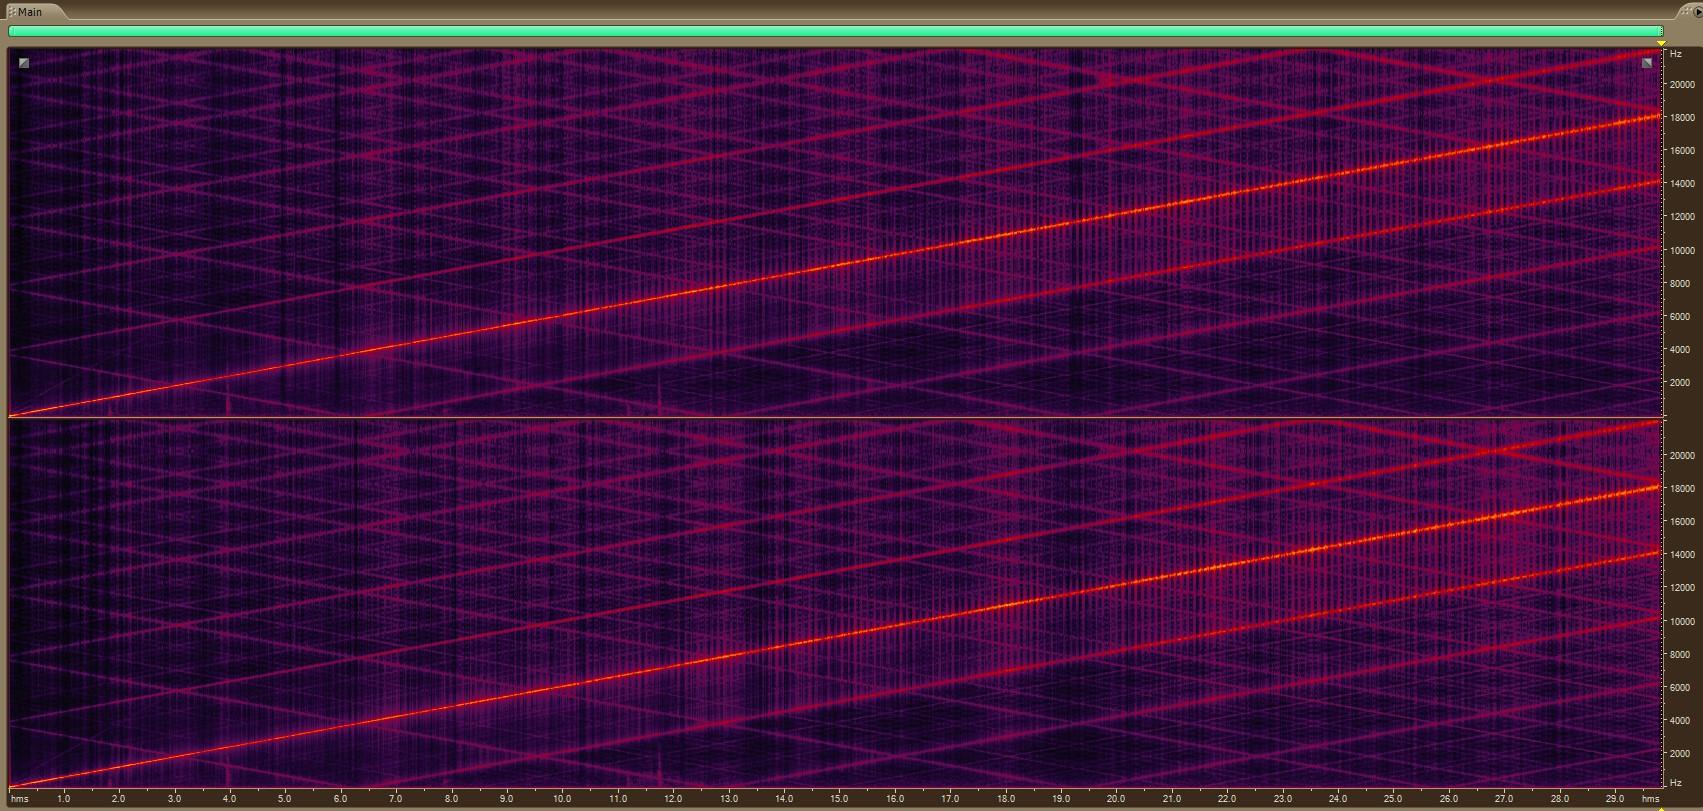 P2 internal mics spectral